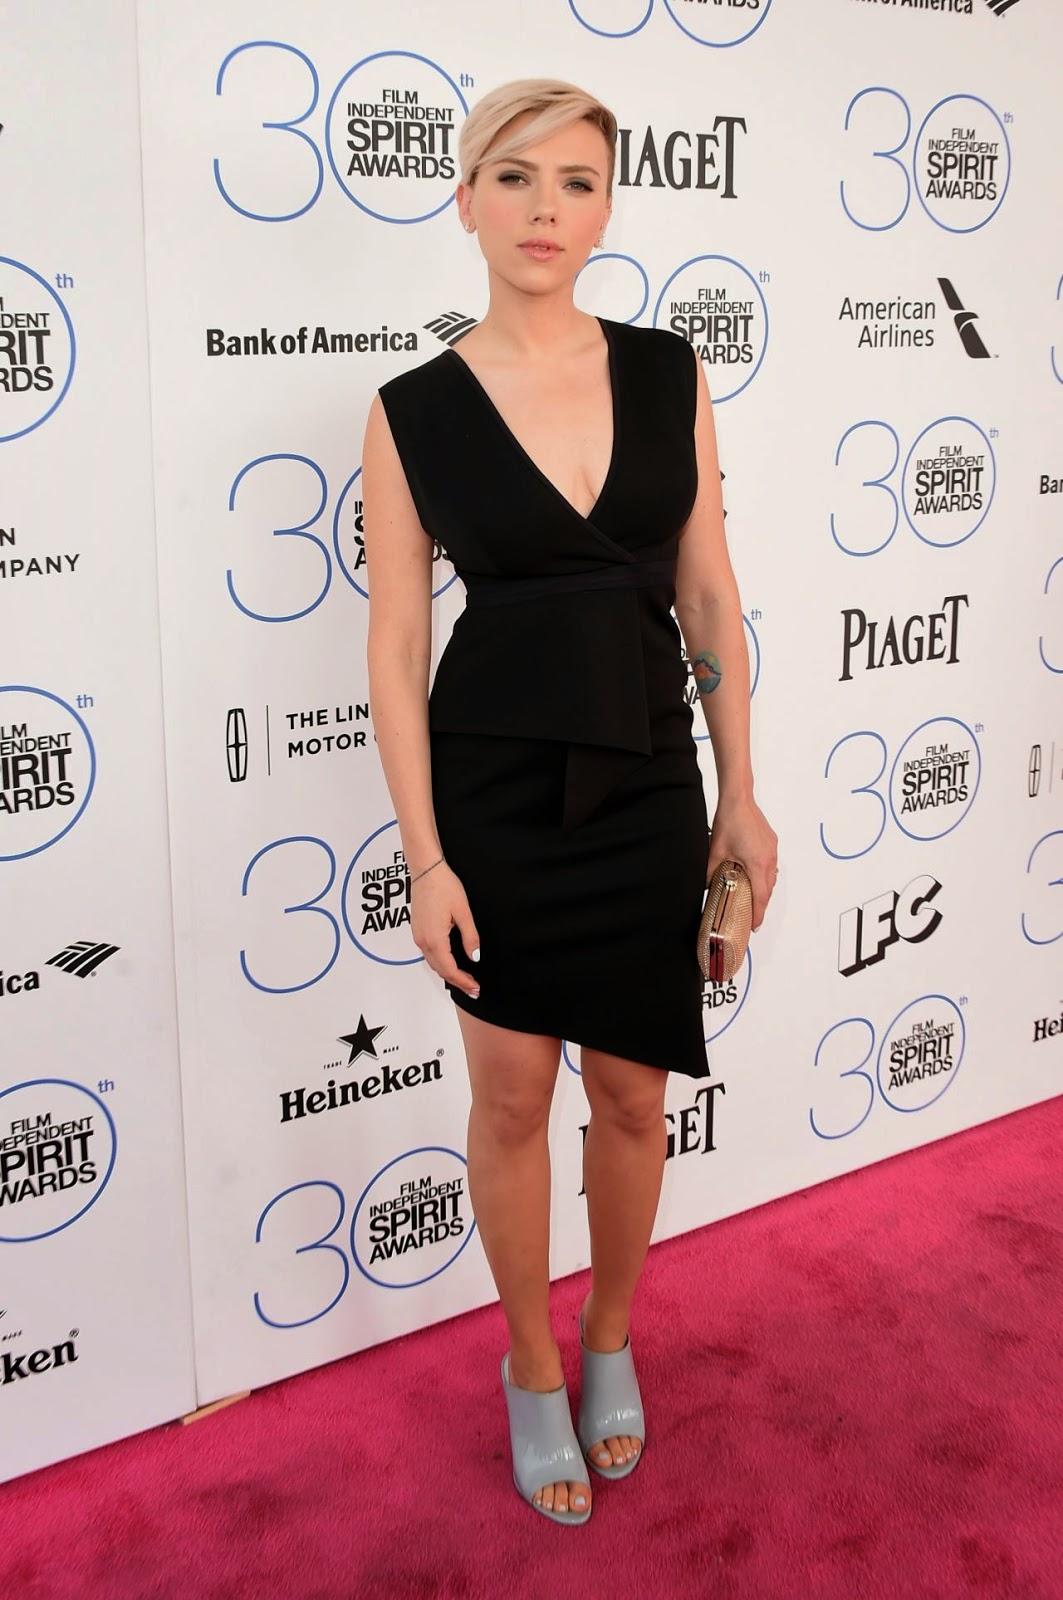 Celebrity Fashion At The 2015 Film Independent Spirit